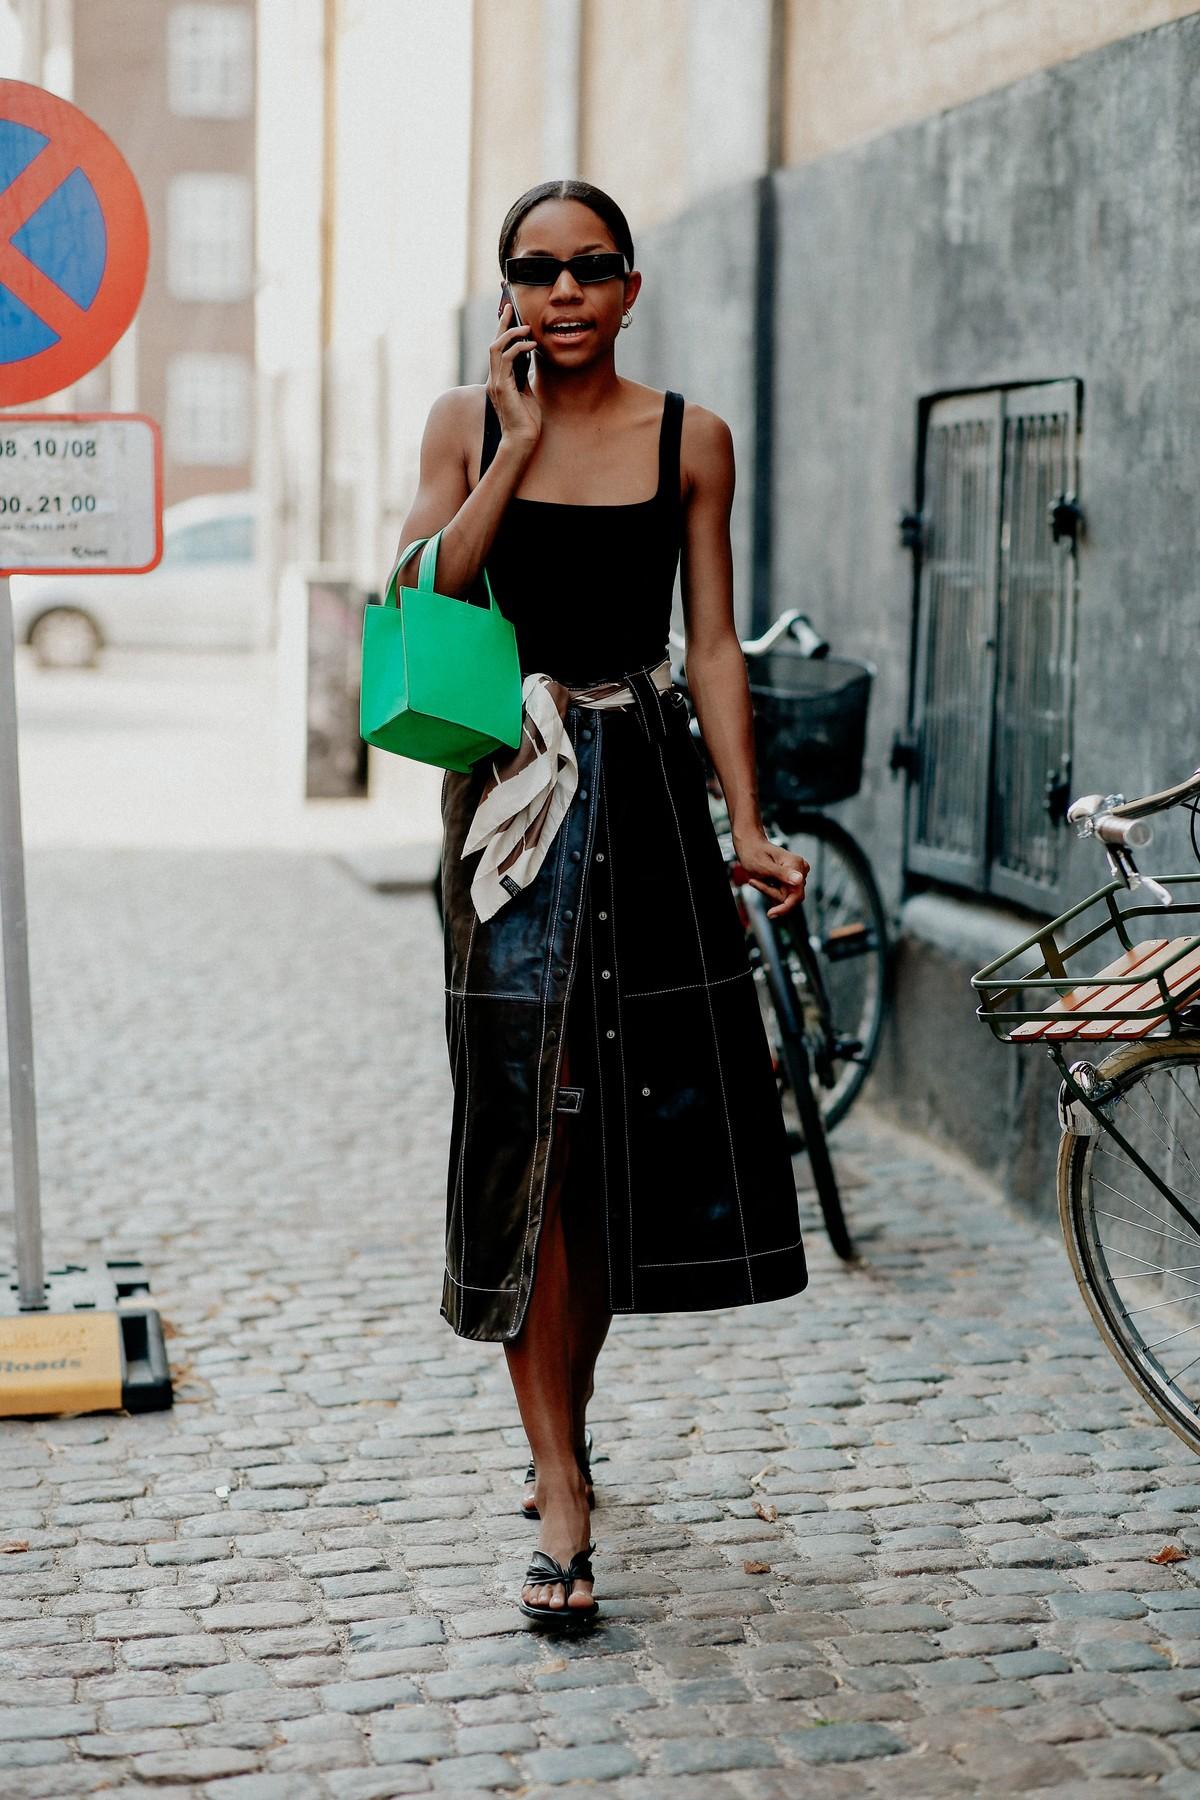 Street style, Bia Jones arriving at Ganni Spring Summer 2021 show, held at Badsmandsstraede, Copenhagen, Denmark, on August 10th, 2020.,Image: 551765182, License: Rights-managed, Restrictions: , Model Release: no, Credit line: Bertrand-Hillion Marie-Paola/ABACA / Abaca Press / Profimedia